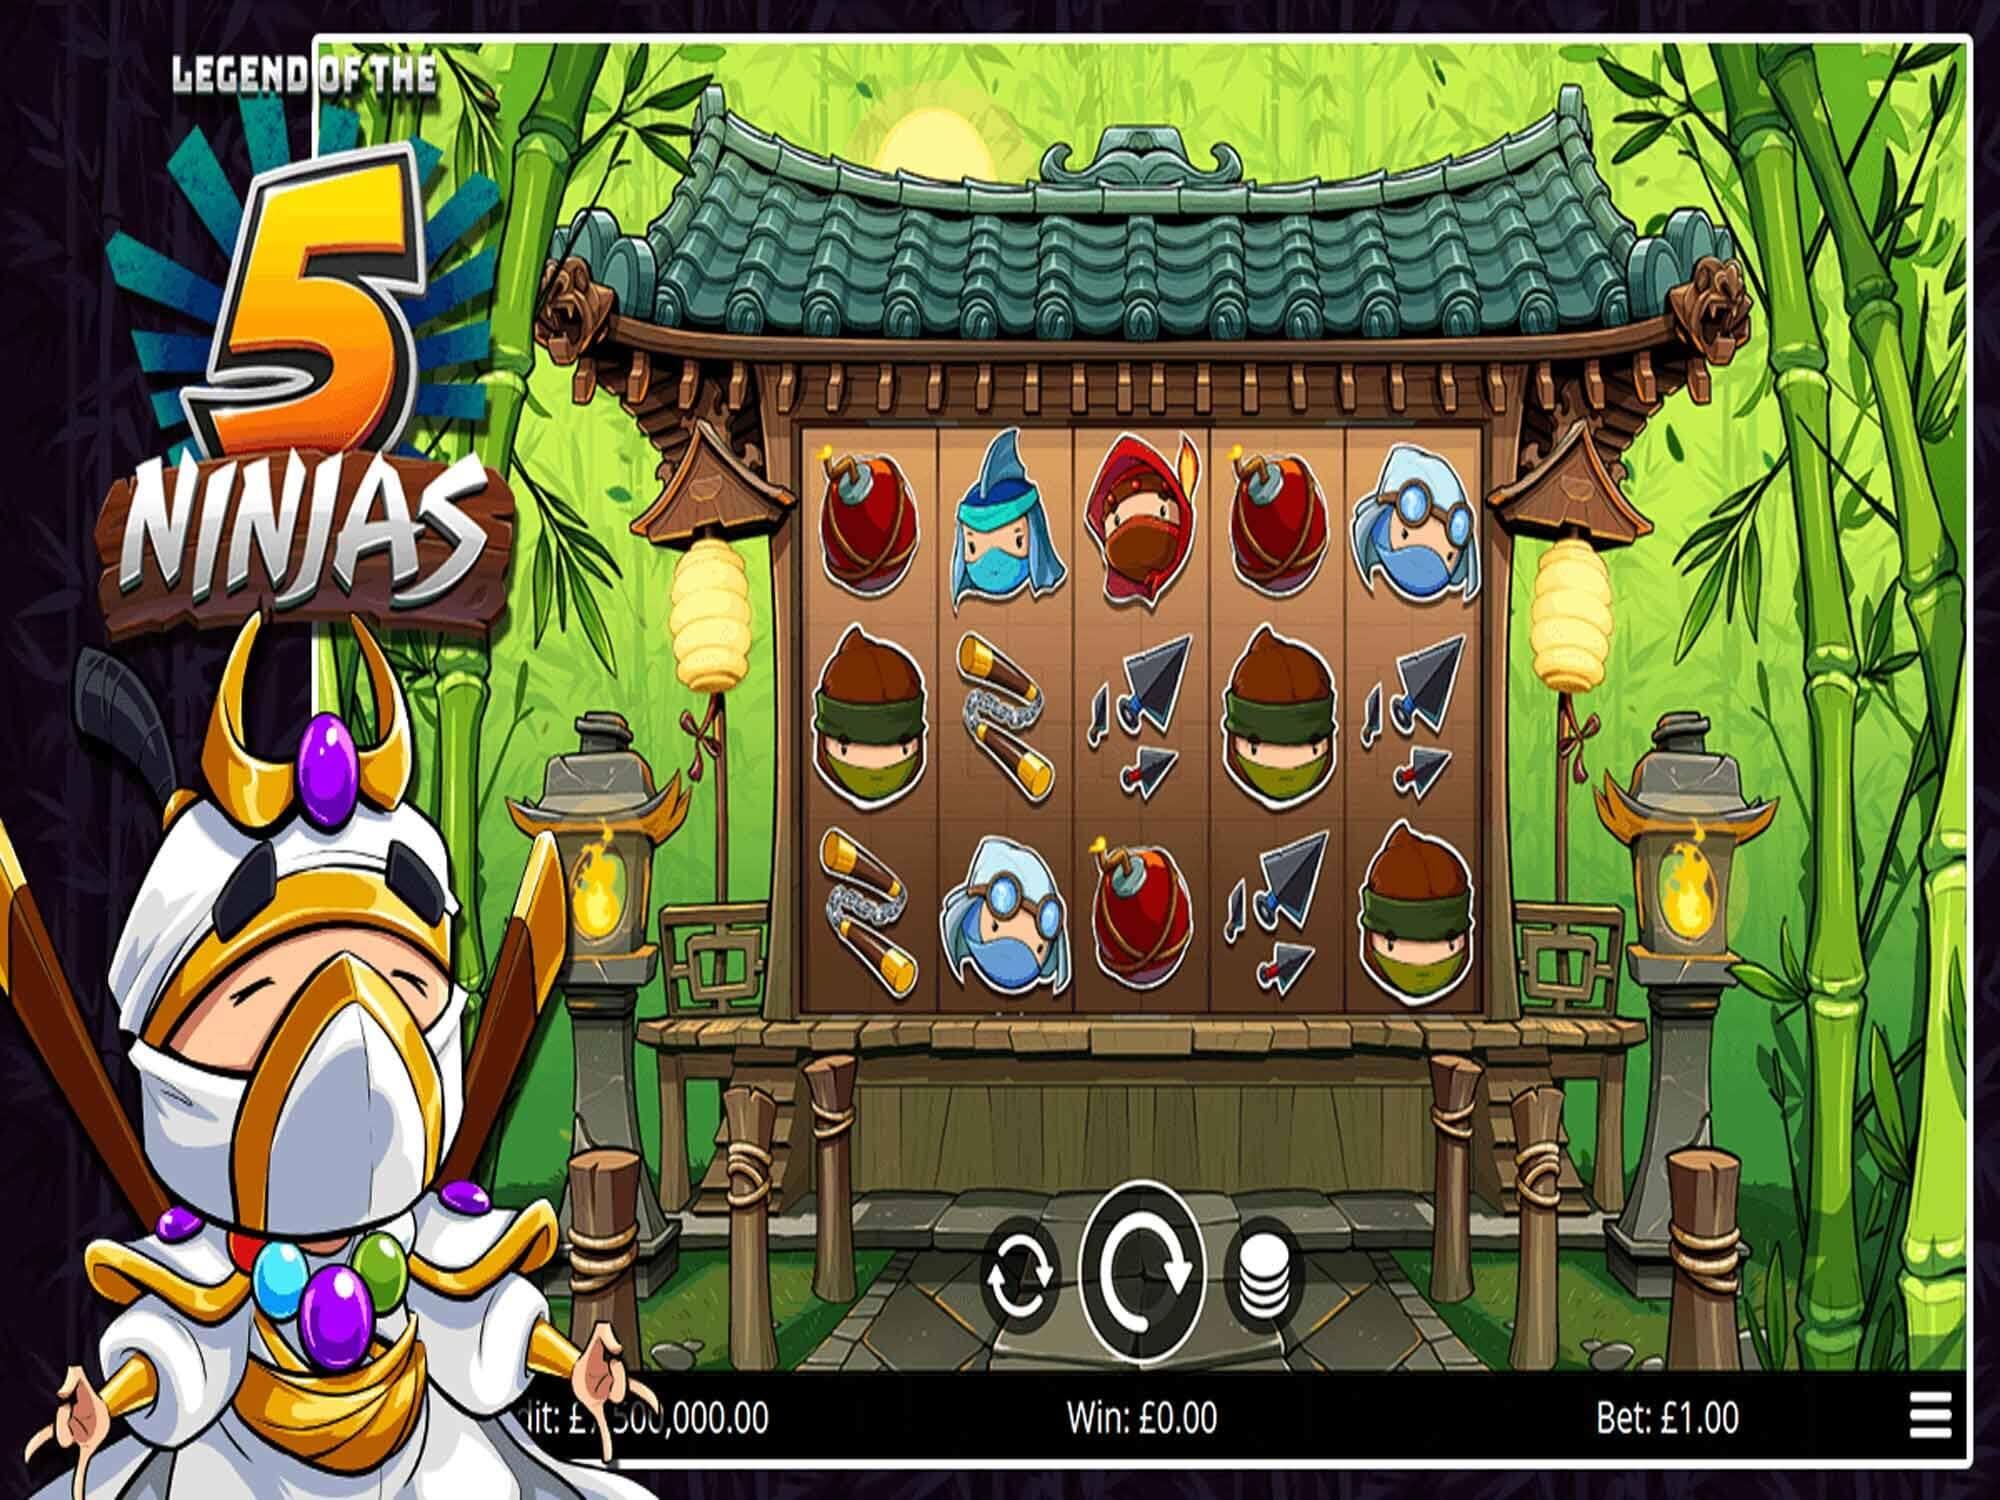 Legend of the 5 Ninjas Bonus